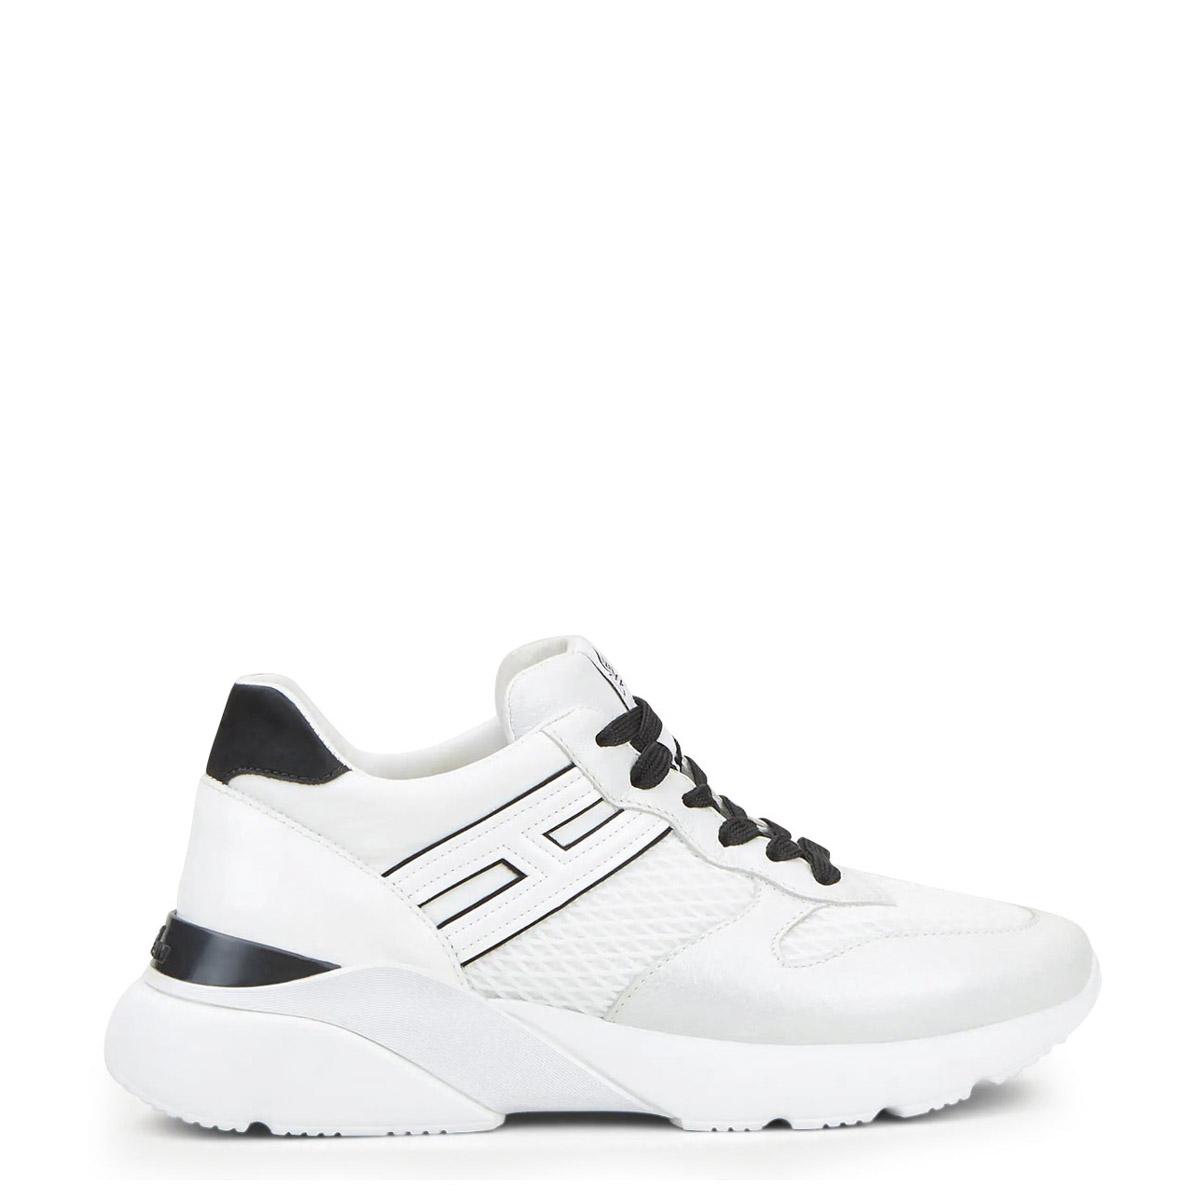 Sneakers γυναικεία Hogan Ασπρο-Μαύρο H835 Active One